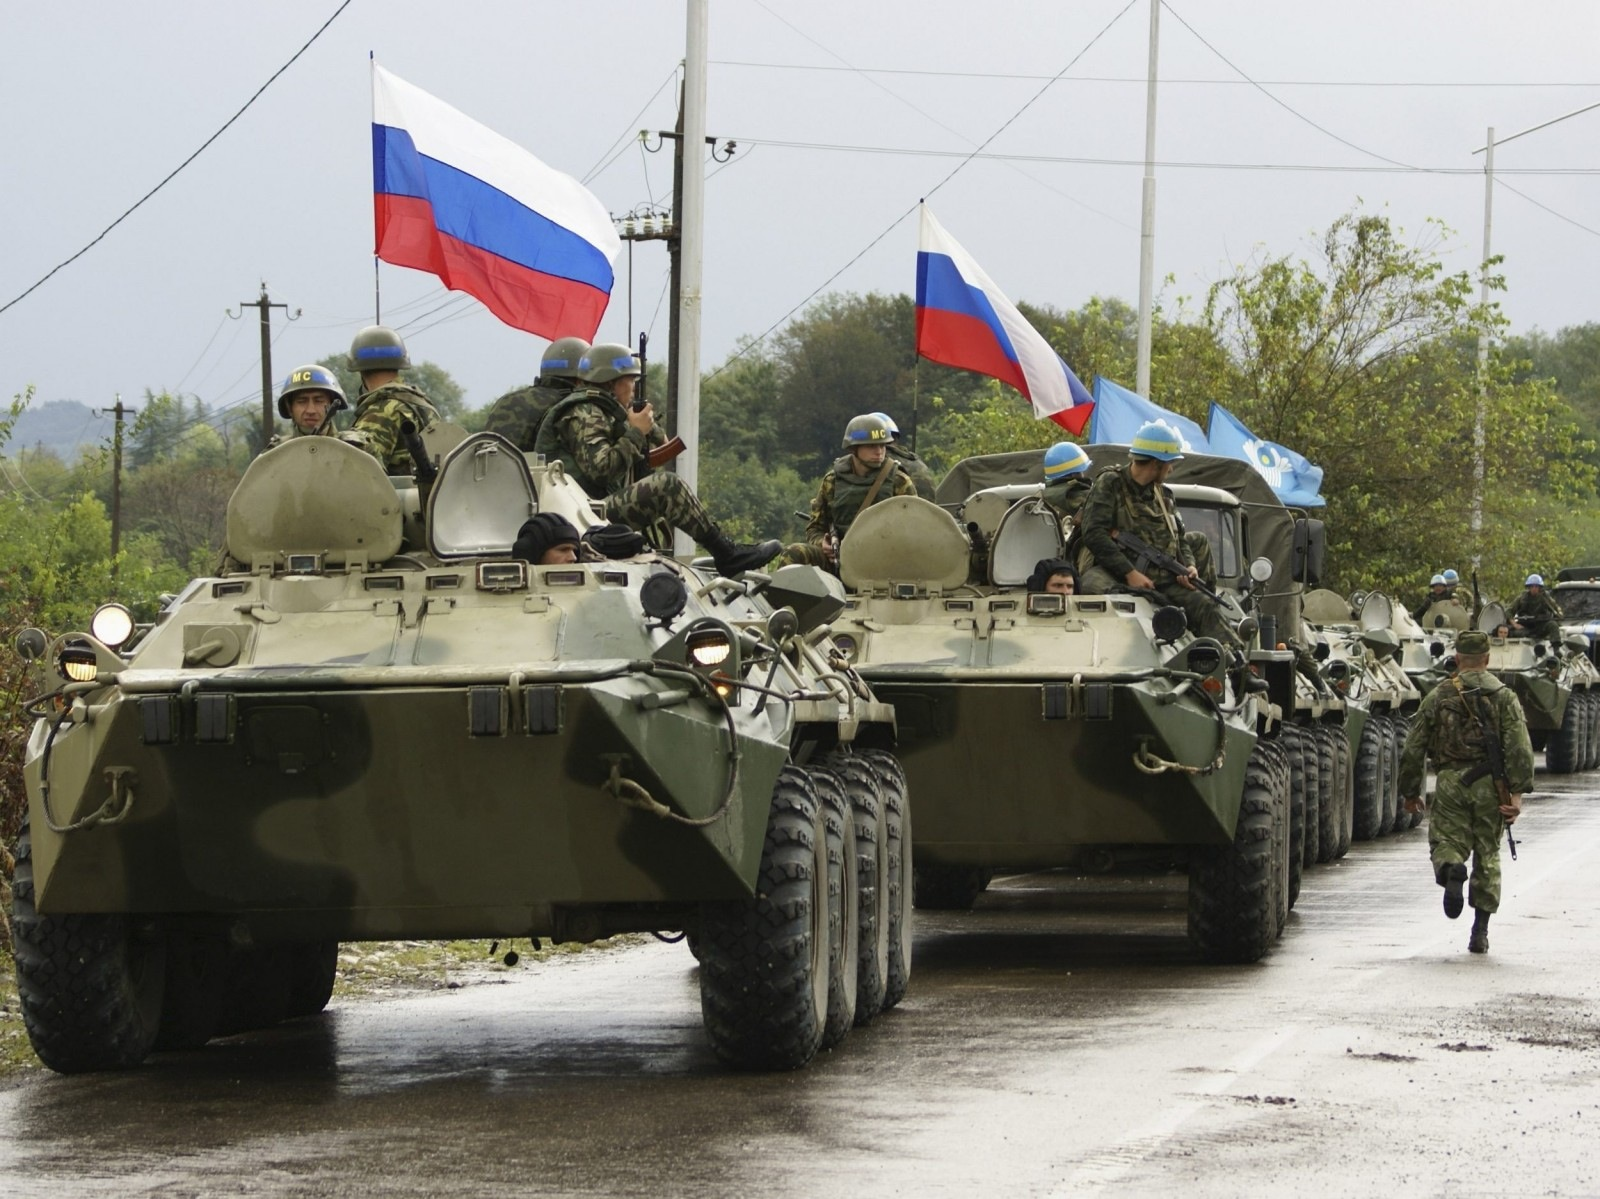 armata rusa transistria, armata rusa, regiunea transnistreana, adunarea generala onu, separatism moldova, armata rusa moldova, tudor ulianovschi